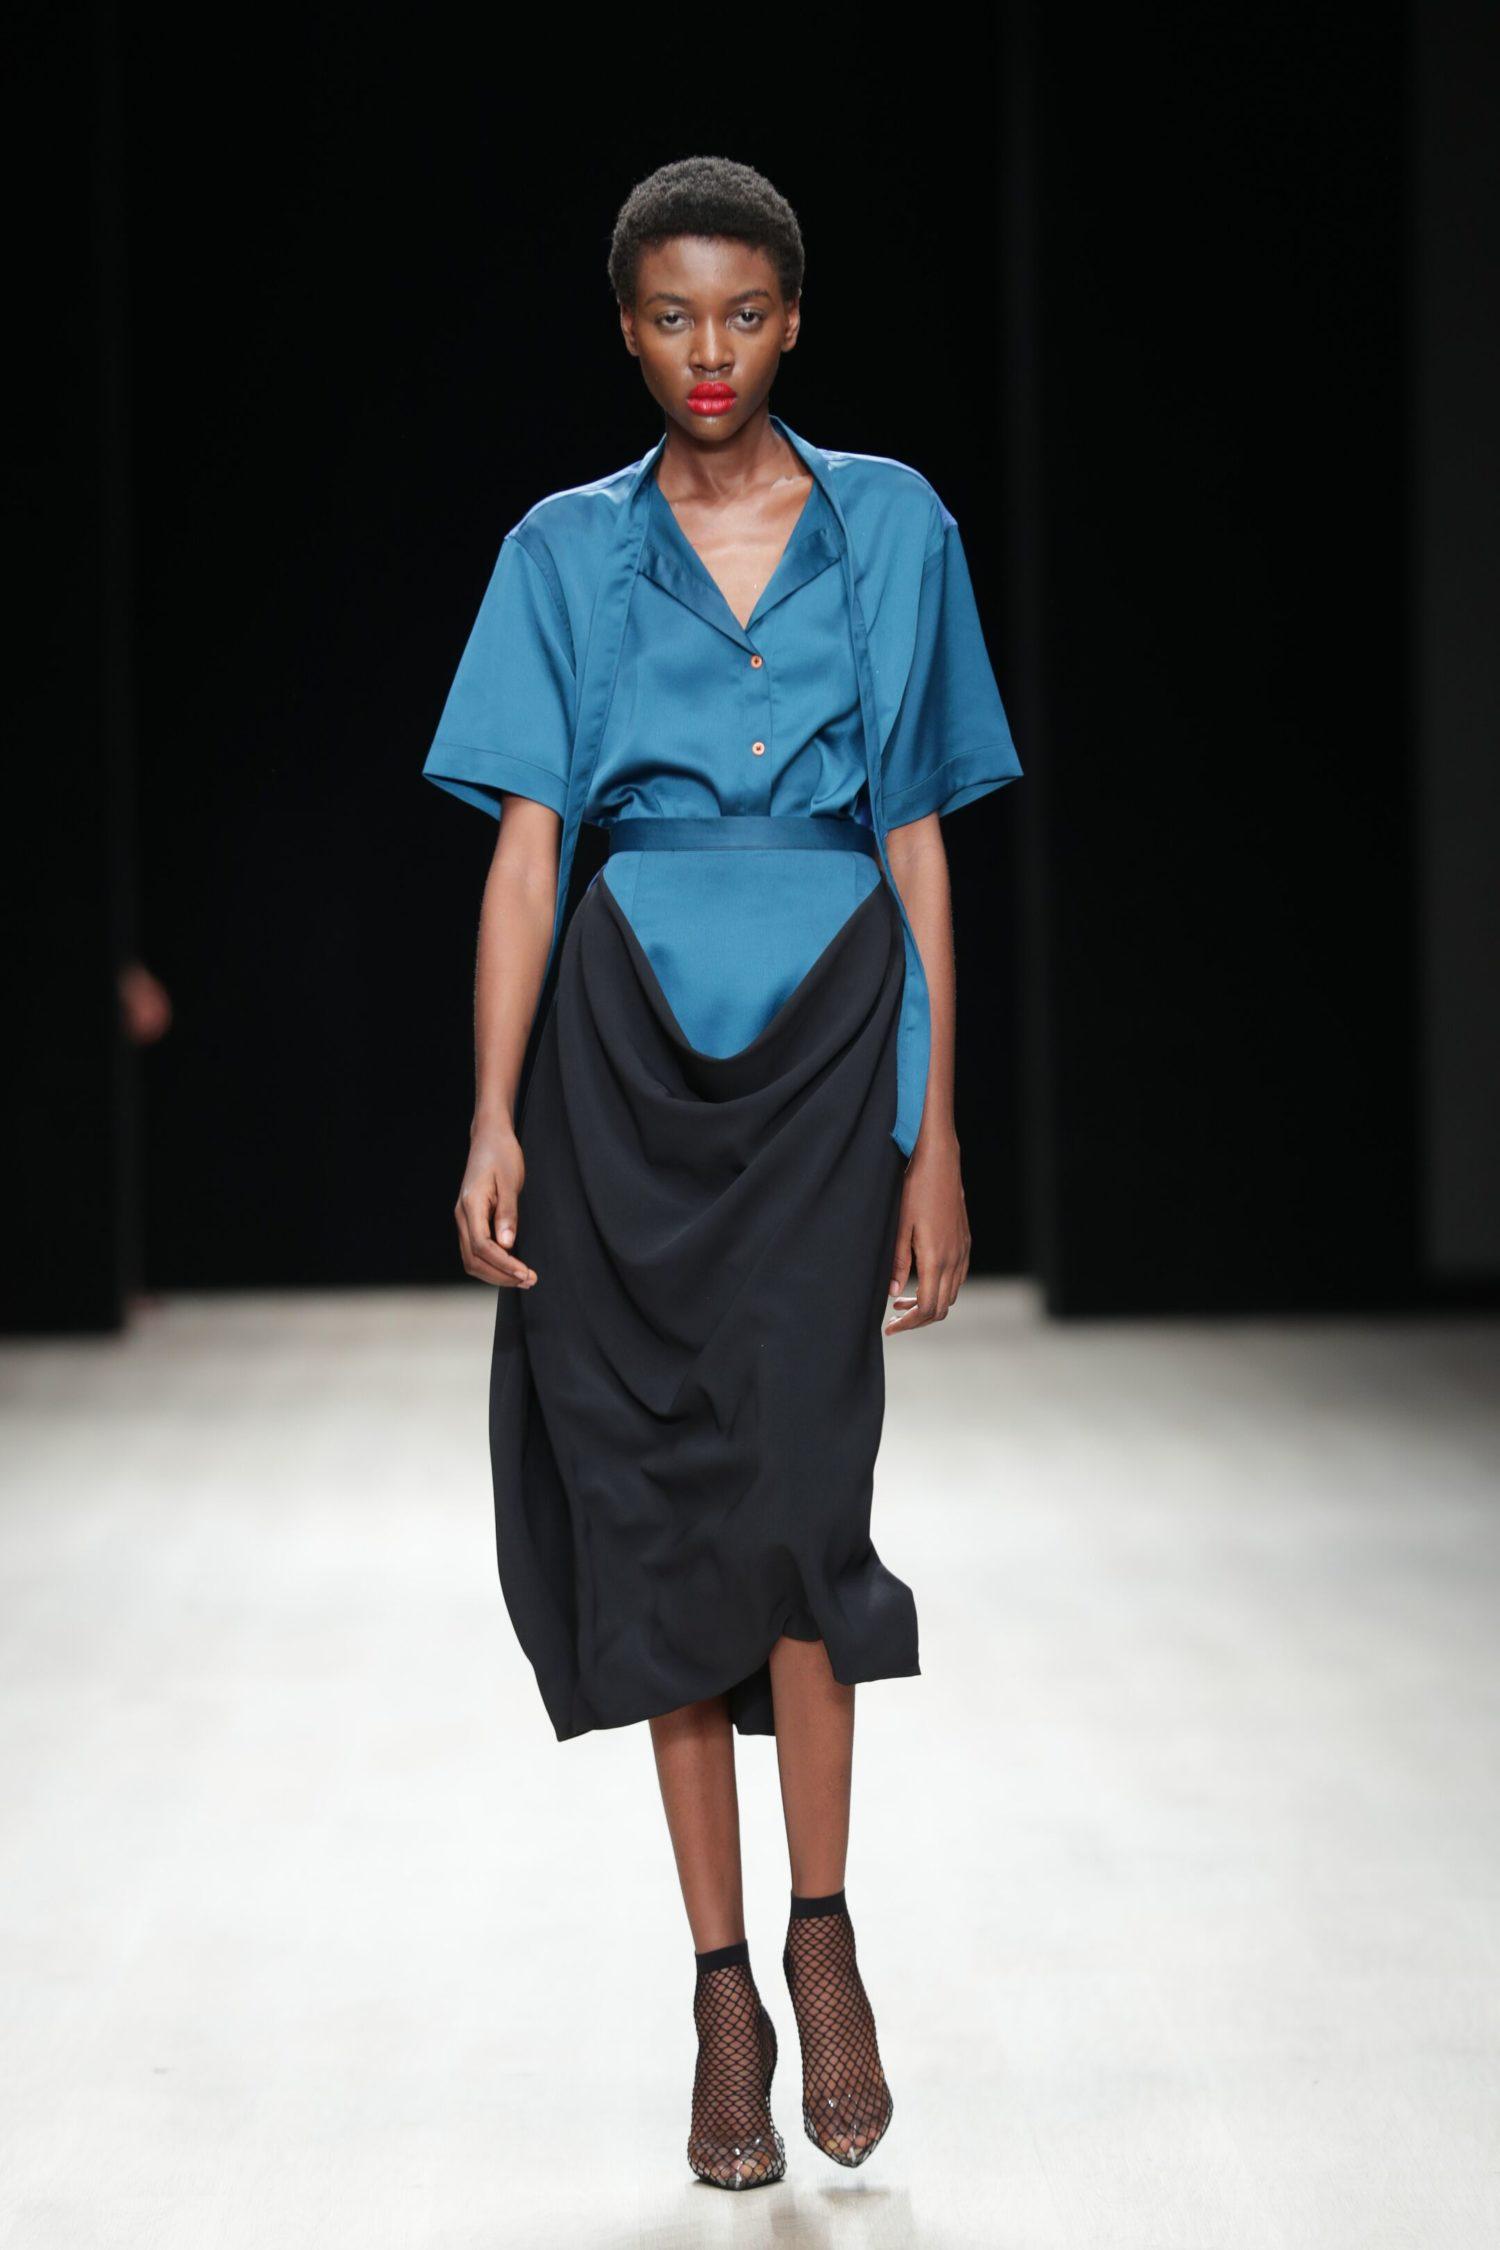 ARISE Fashion Week 2019   Gozel Green